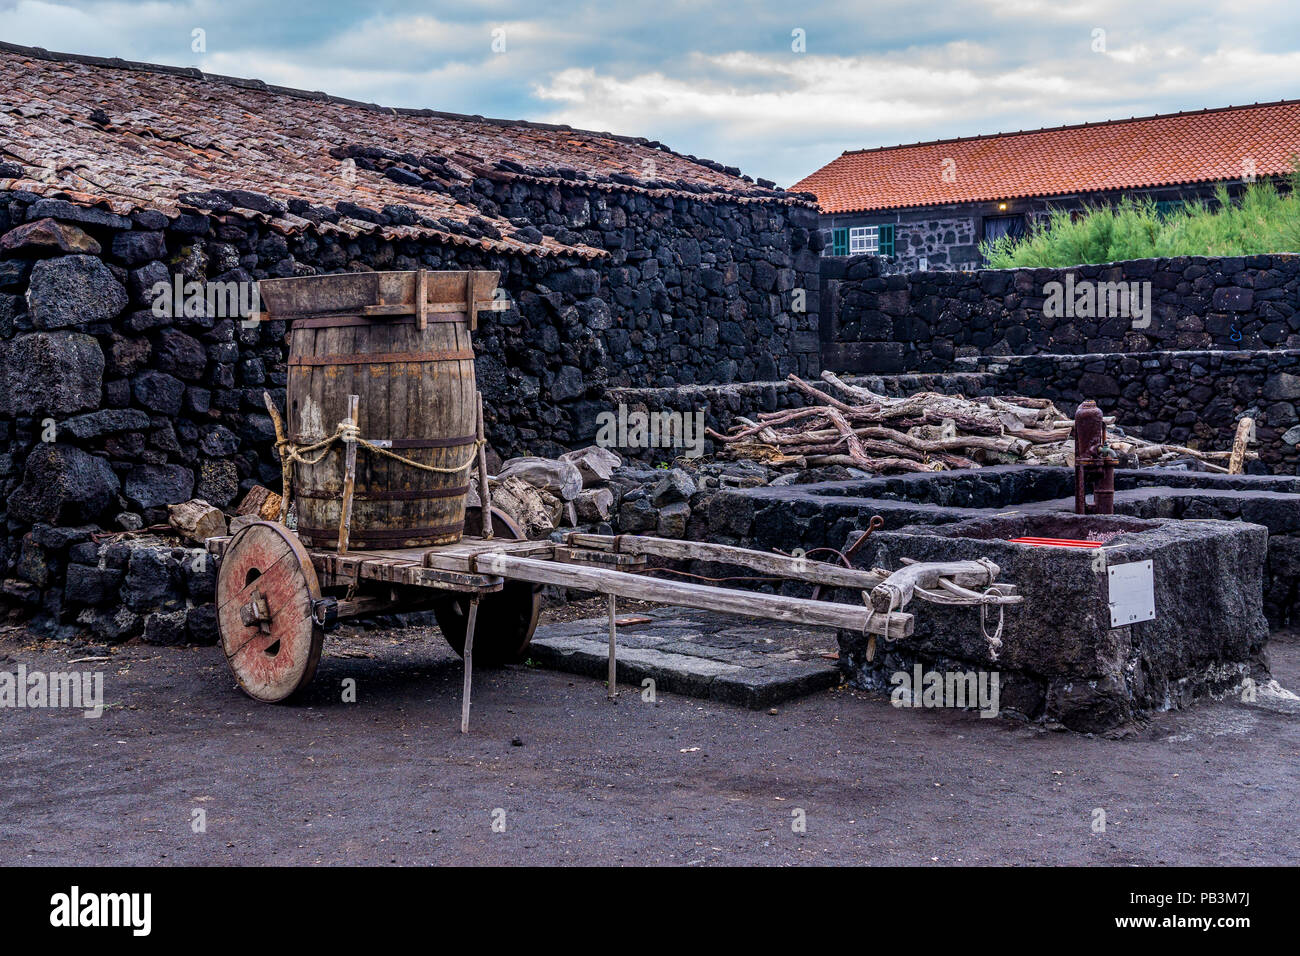 Wine barrel on a cart, near the Lajido Vineyard Culture Interpretation Centre on Pico Island, Azores - Stock Image